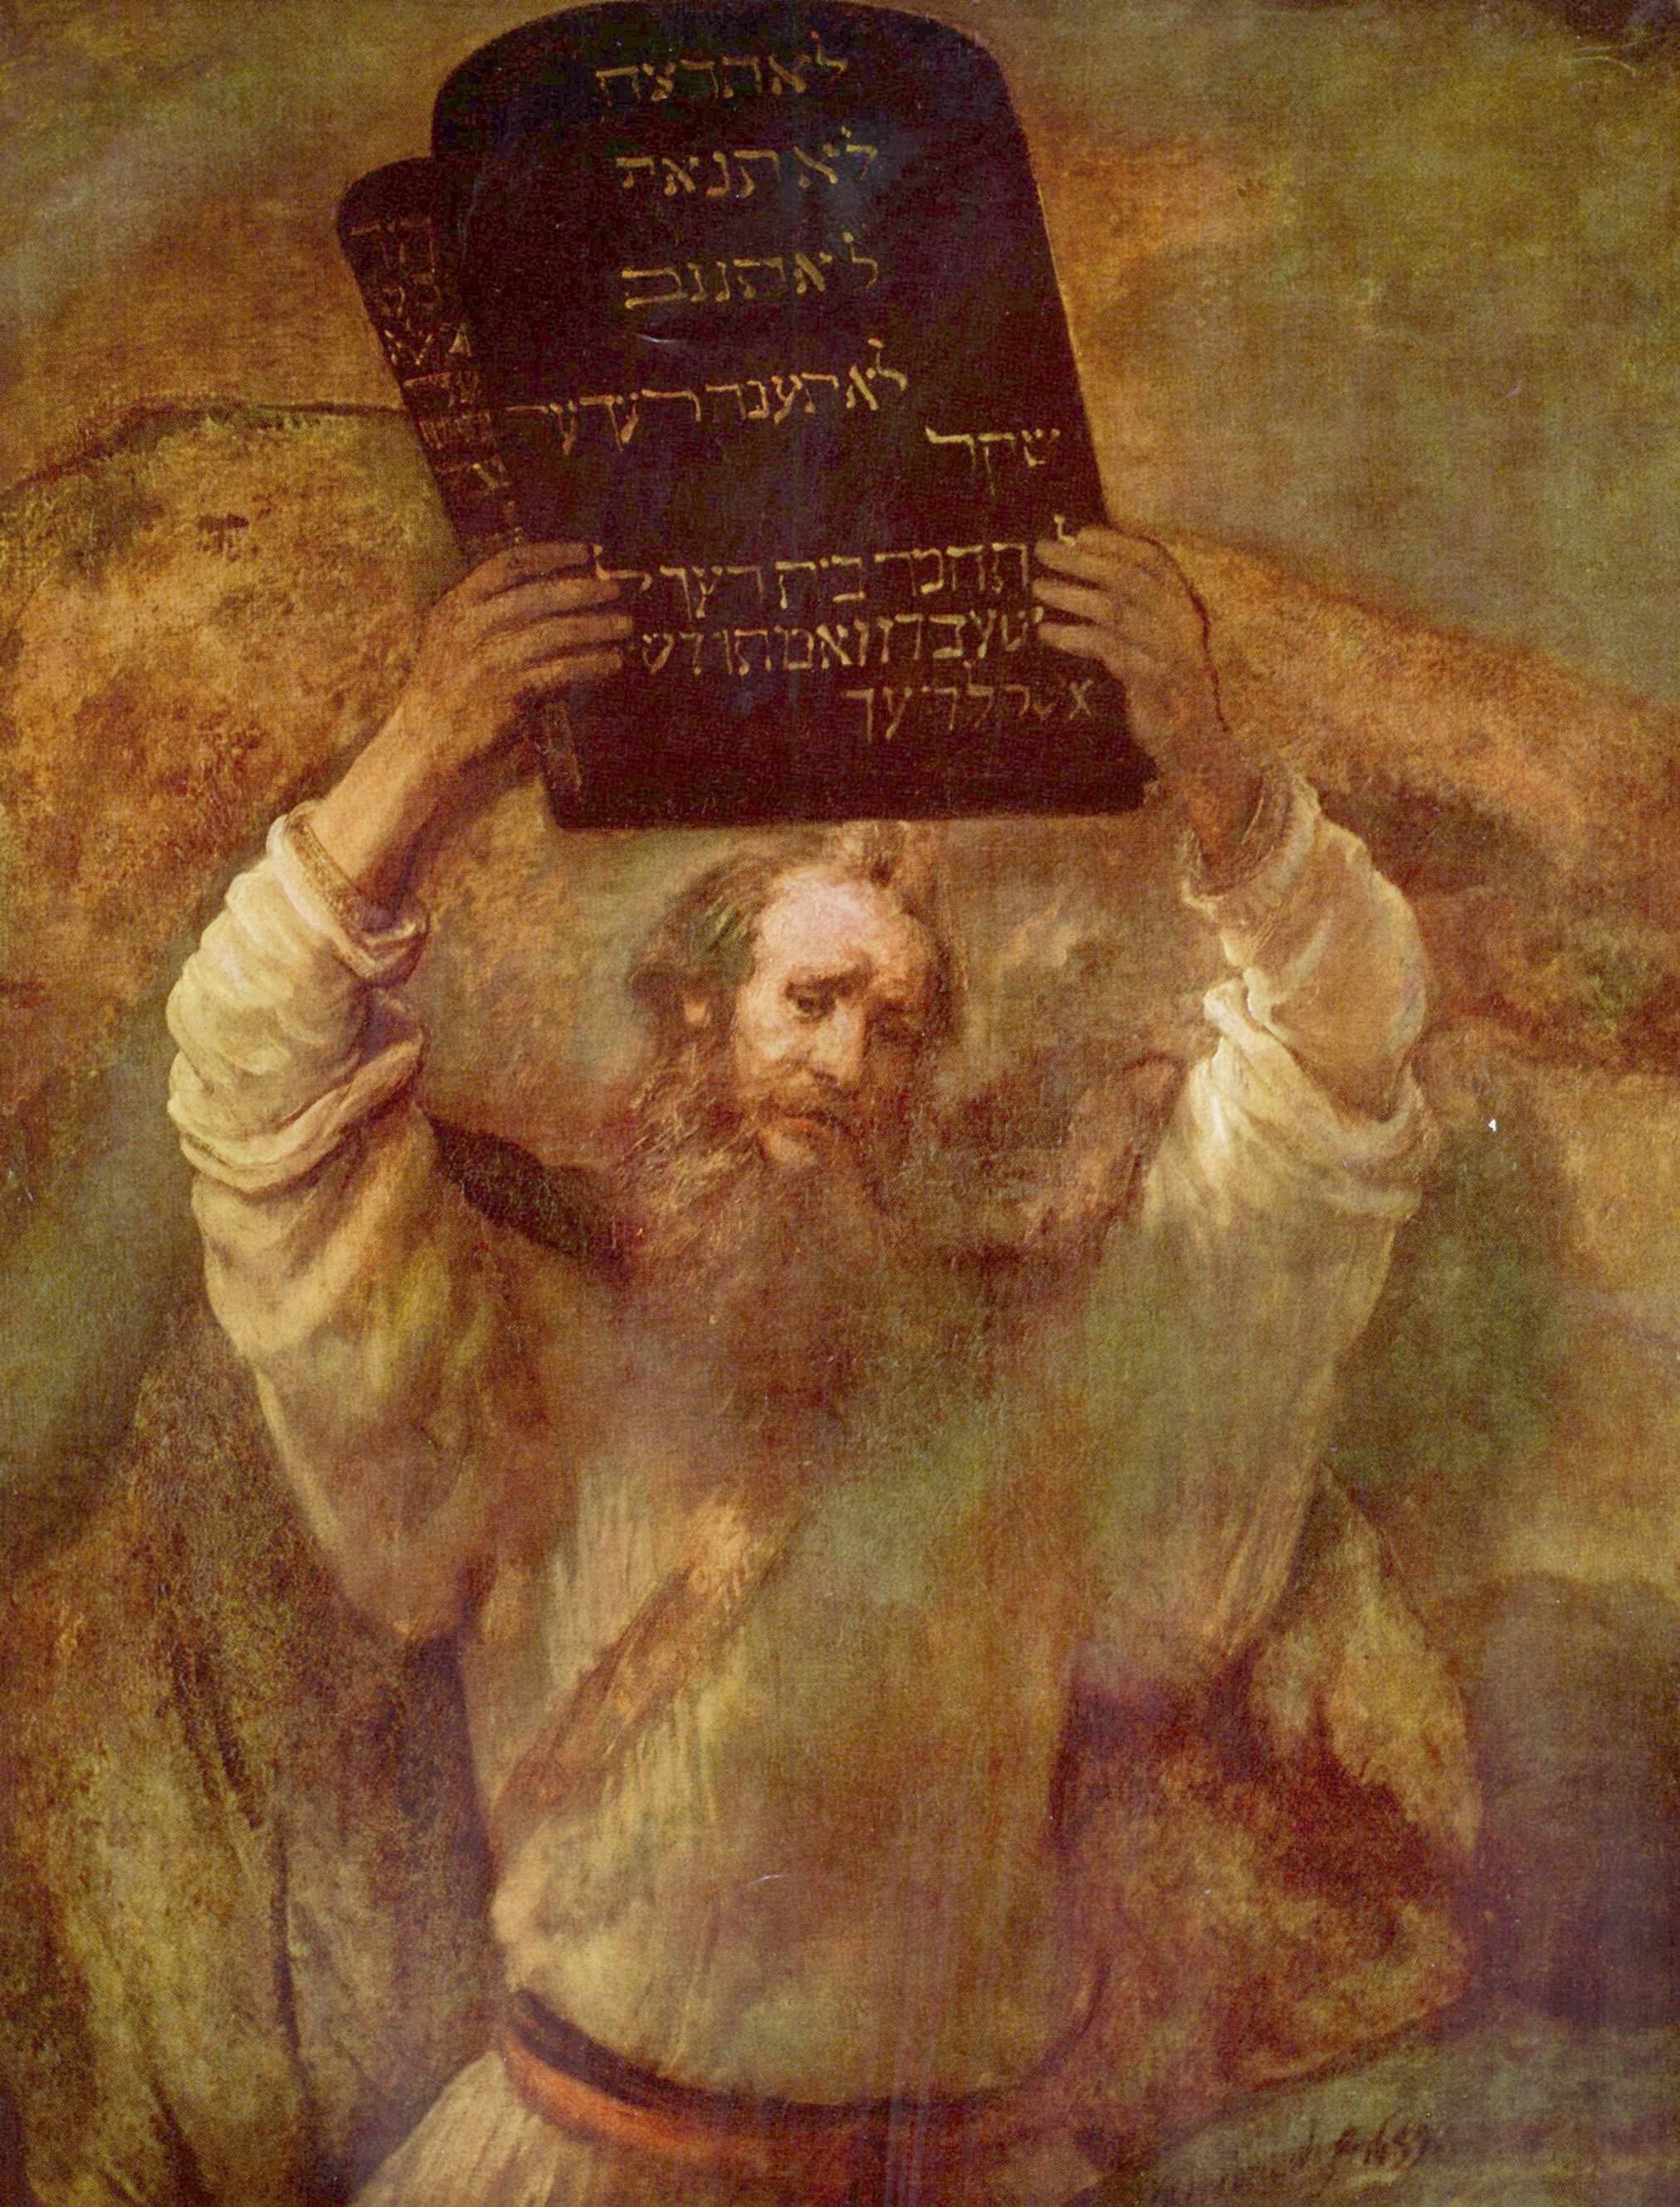 https://i1.wp.com/upload.wikimedia.org/wikipedia/commons/4/4a/Rembrandt_Harmensz._van_Rijn_079.jpg